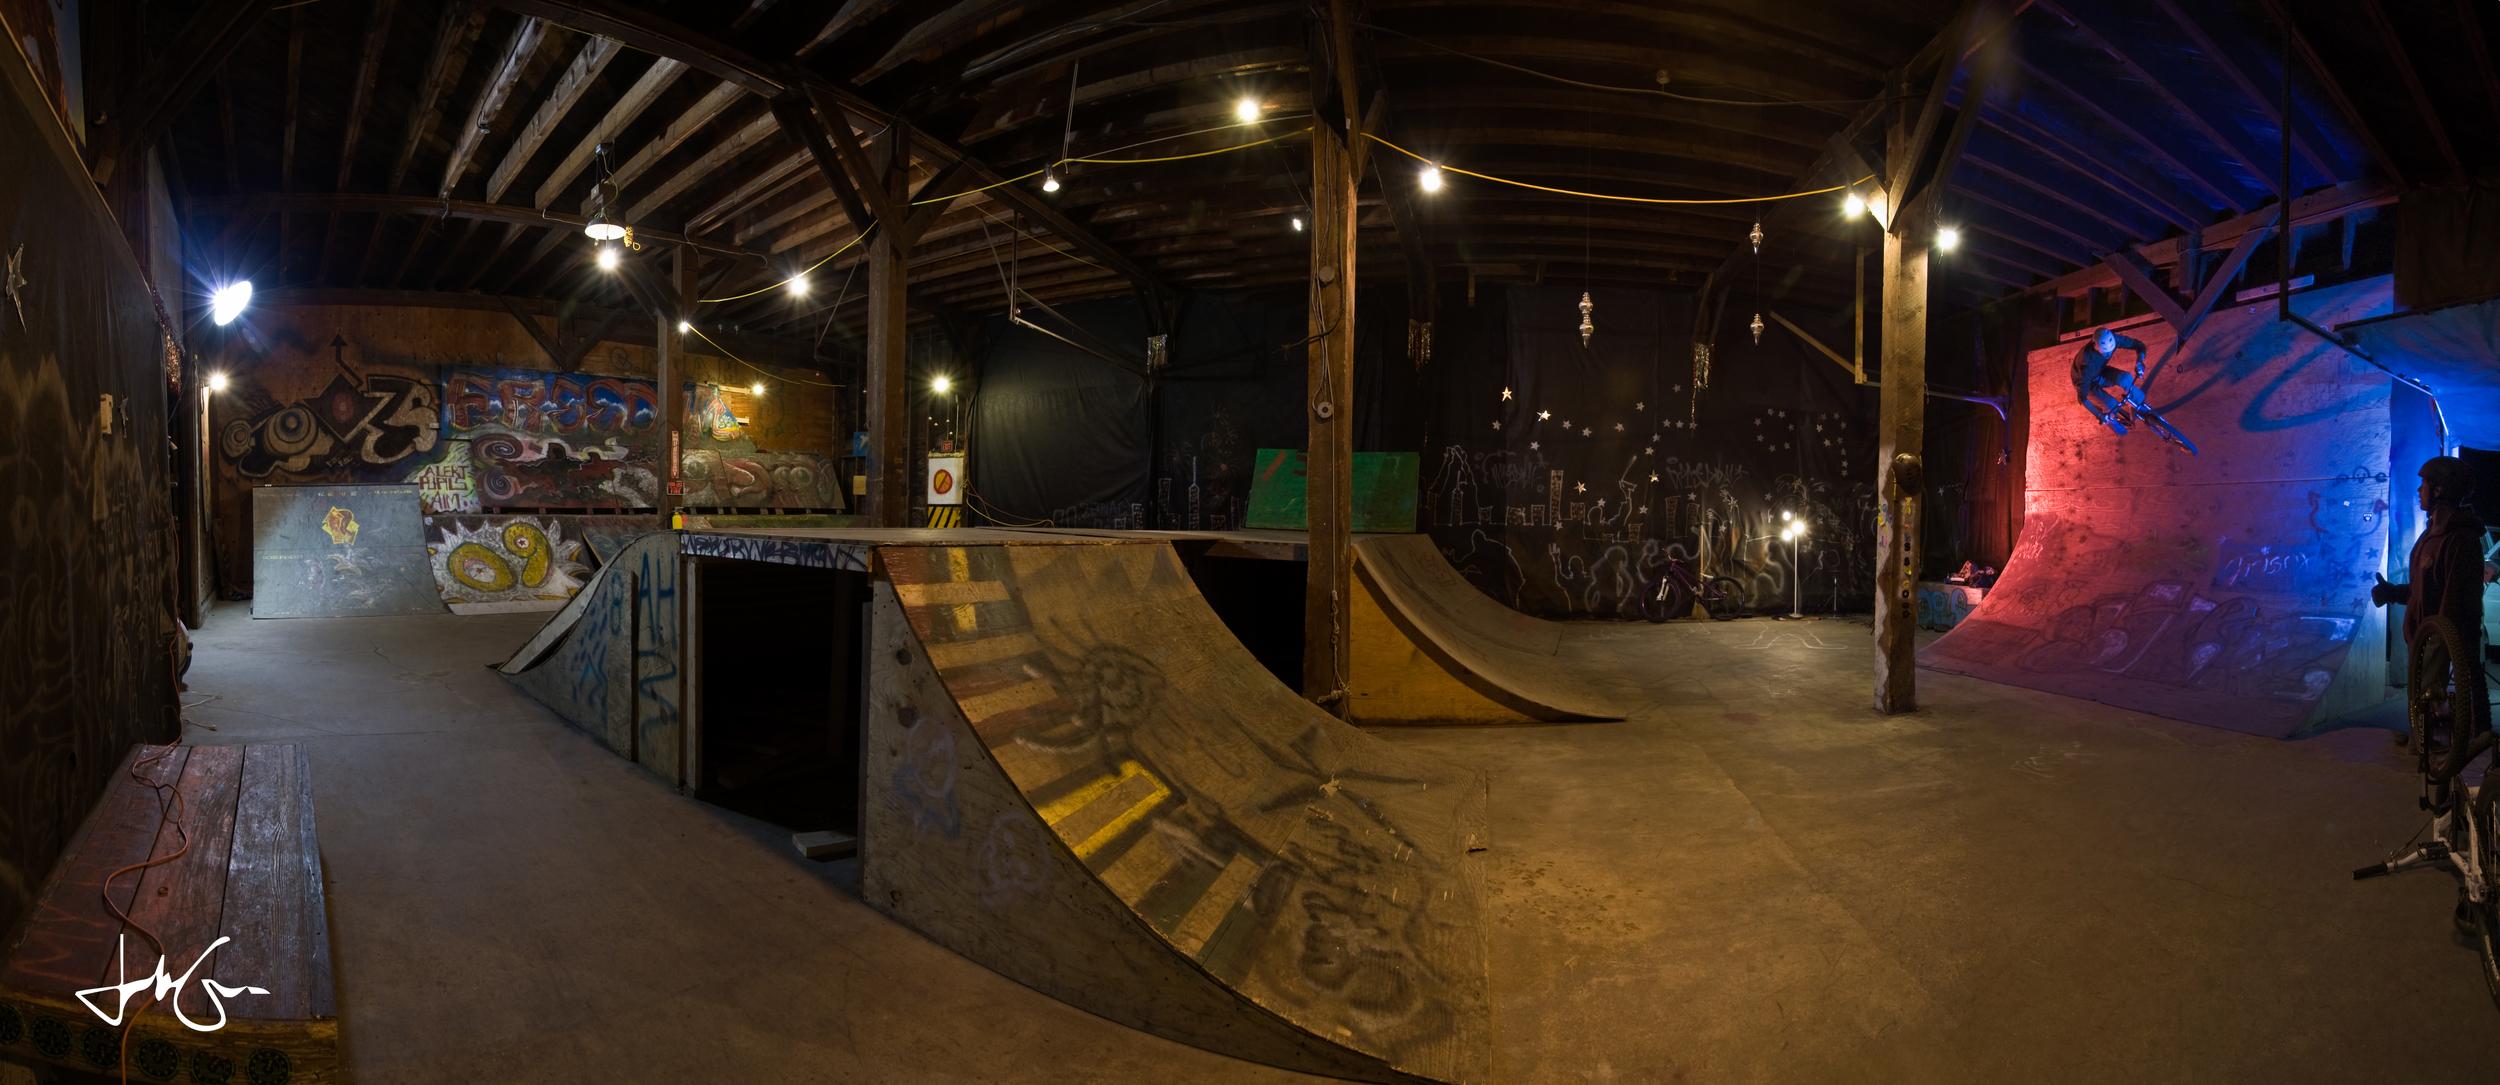 Garage park Pano.jpg